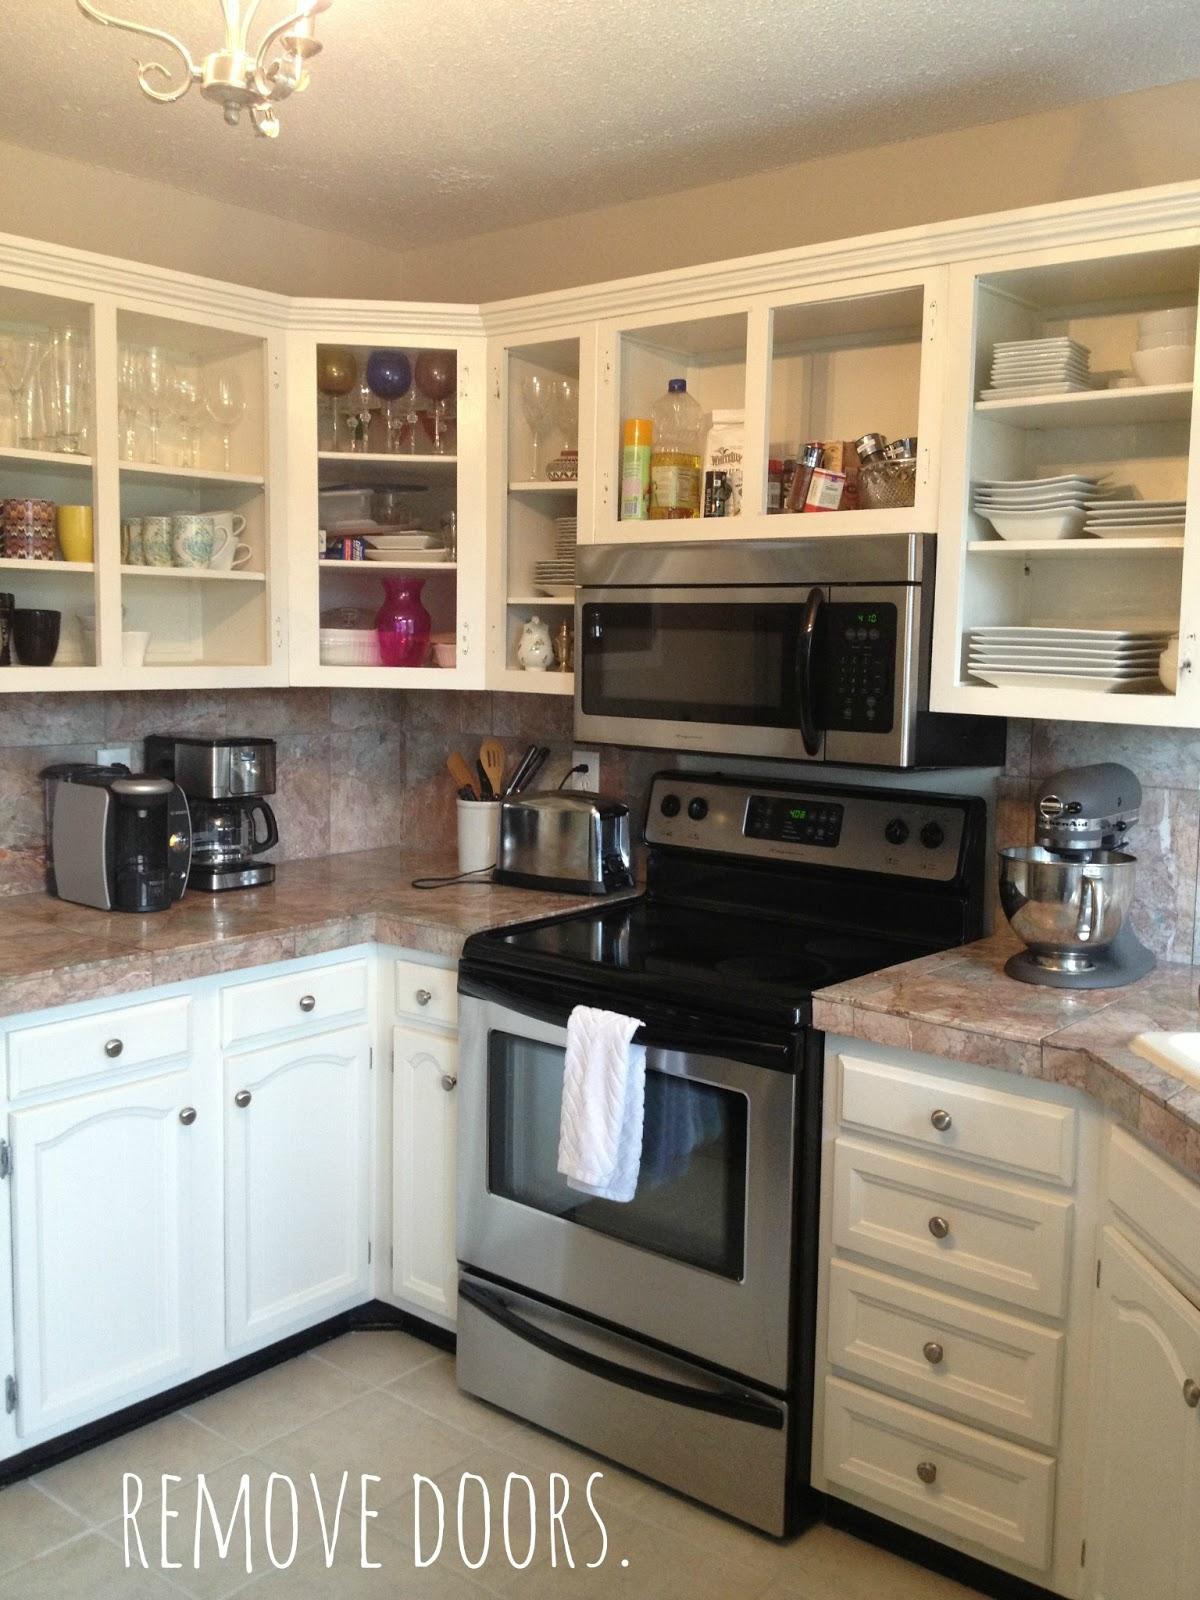 LiveLoveDIY & LiveLoveDIY: How To Paint Kitchen Cabinets in 10 Easy Steps Pezcame.Com